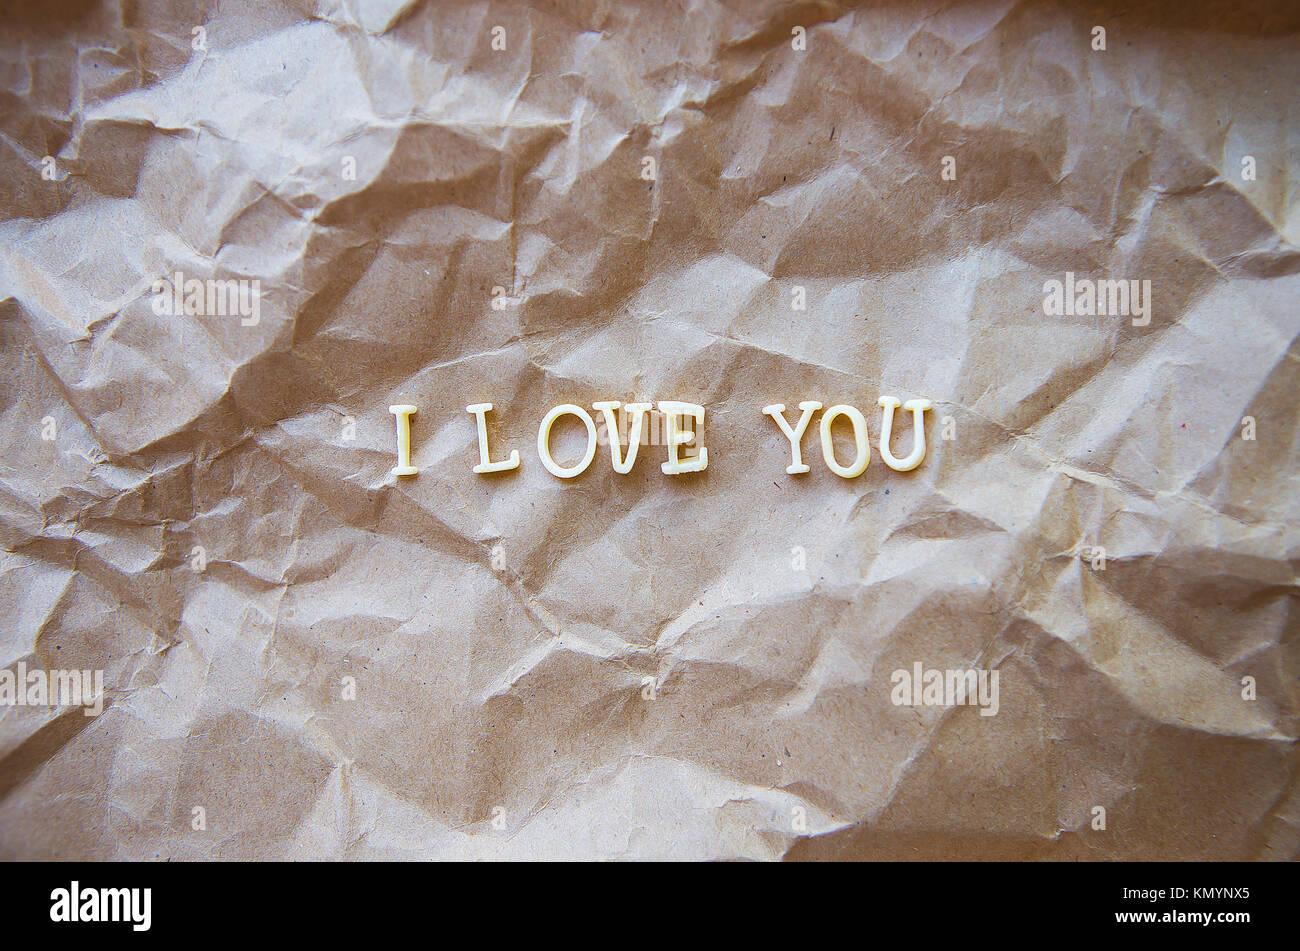 I love you written on kraft paper. - Stock Image